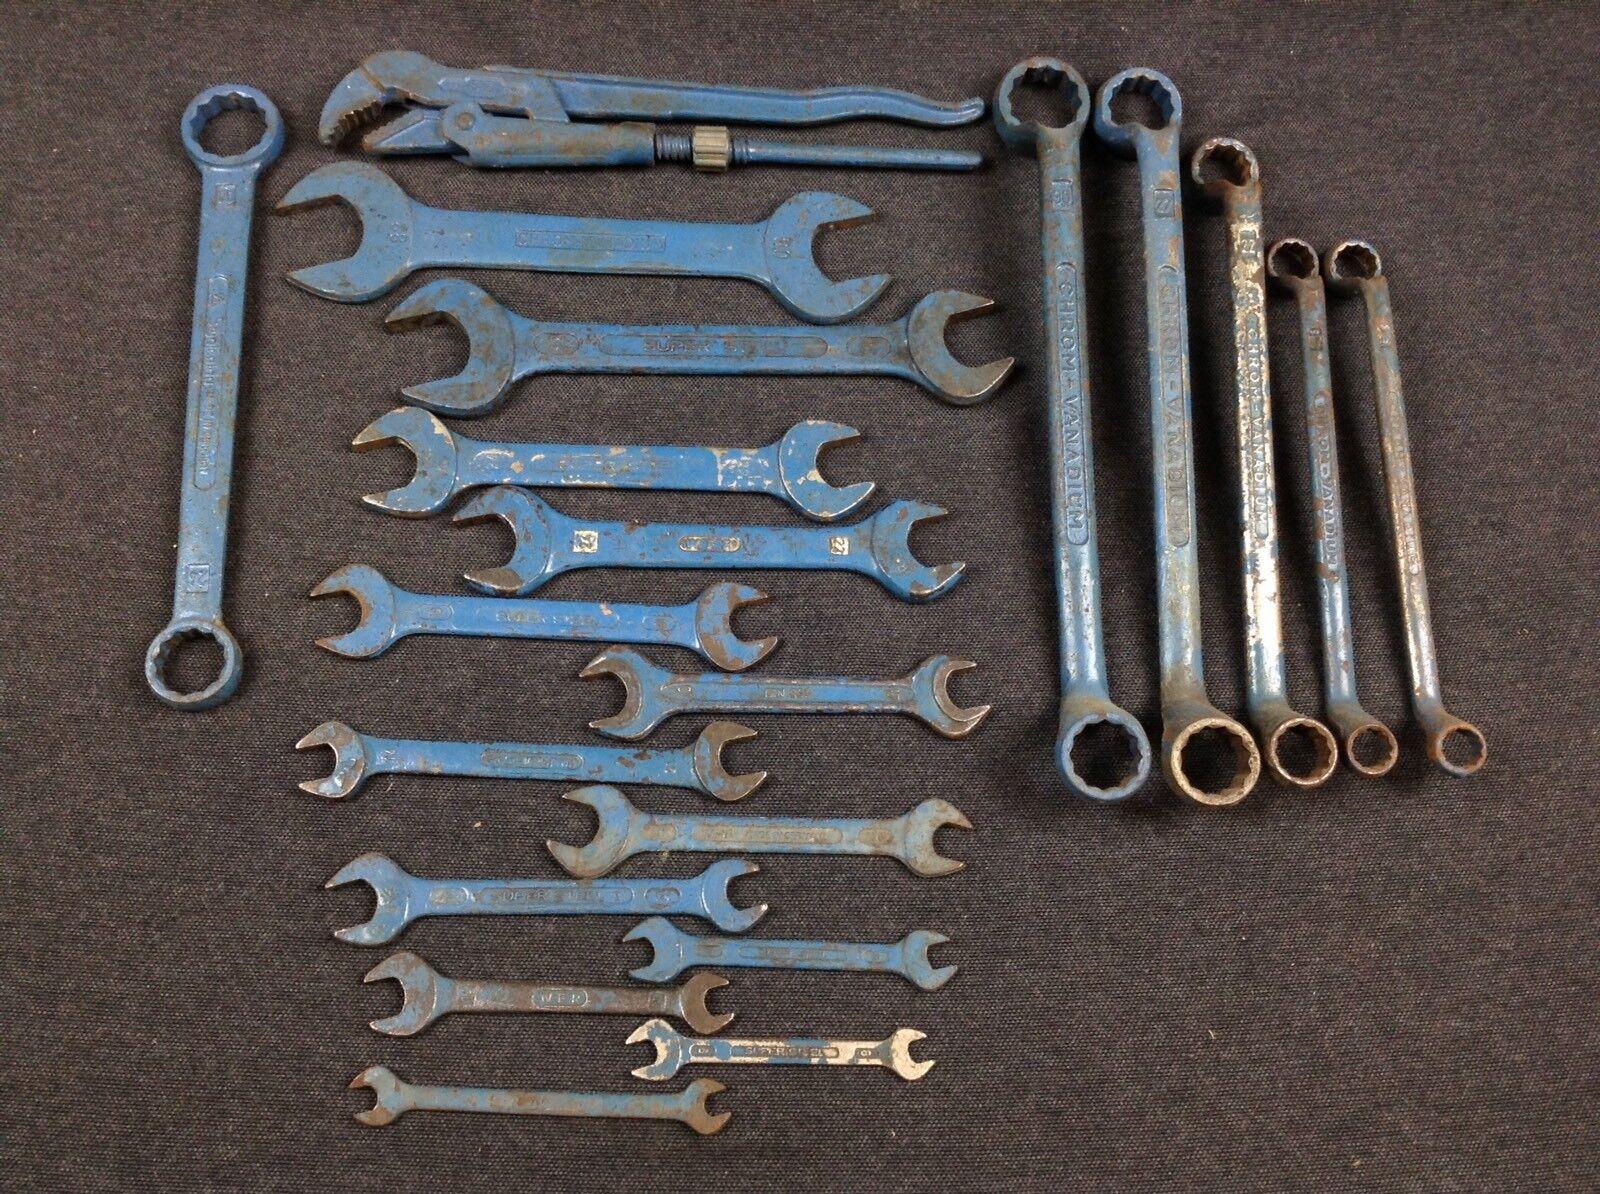 Alte Maulschlüssel Ringschlüssel Smalcalda DDR Bordwerkzeug Auto Werkzeug